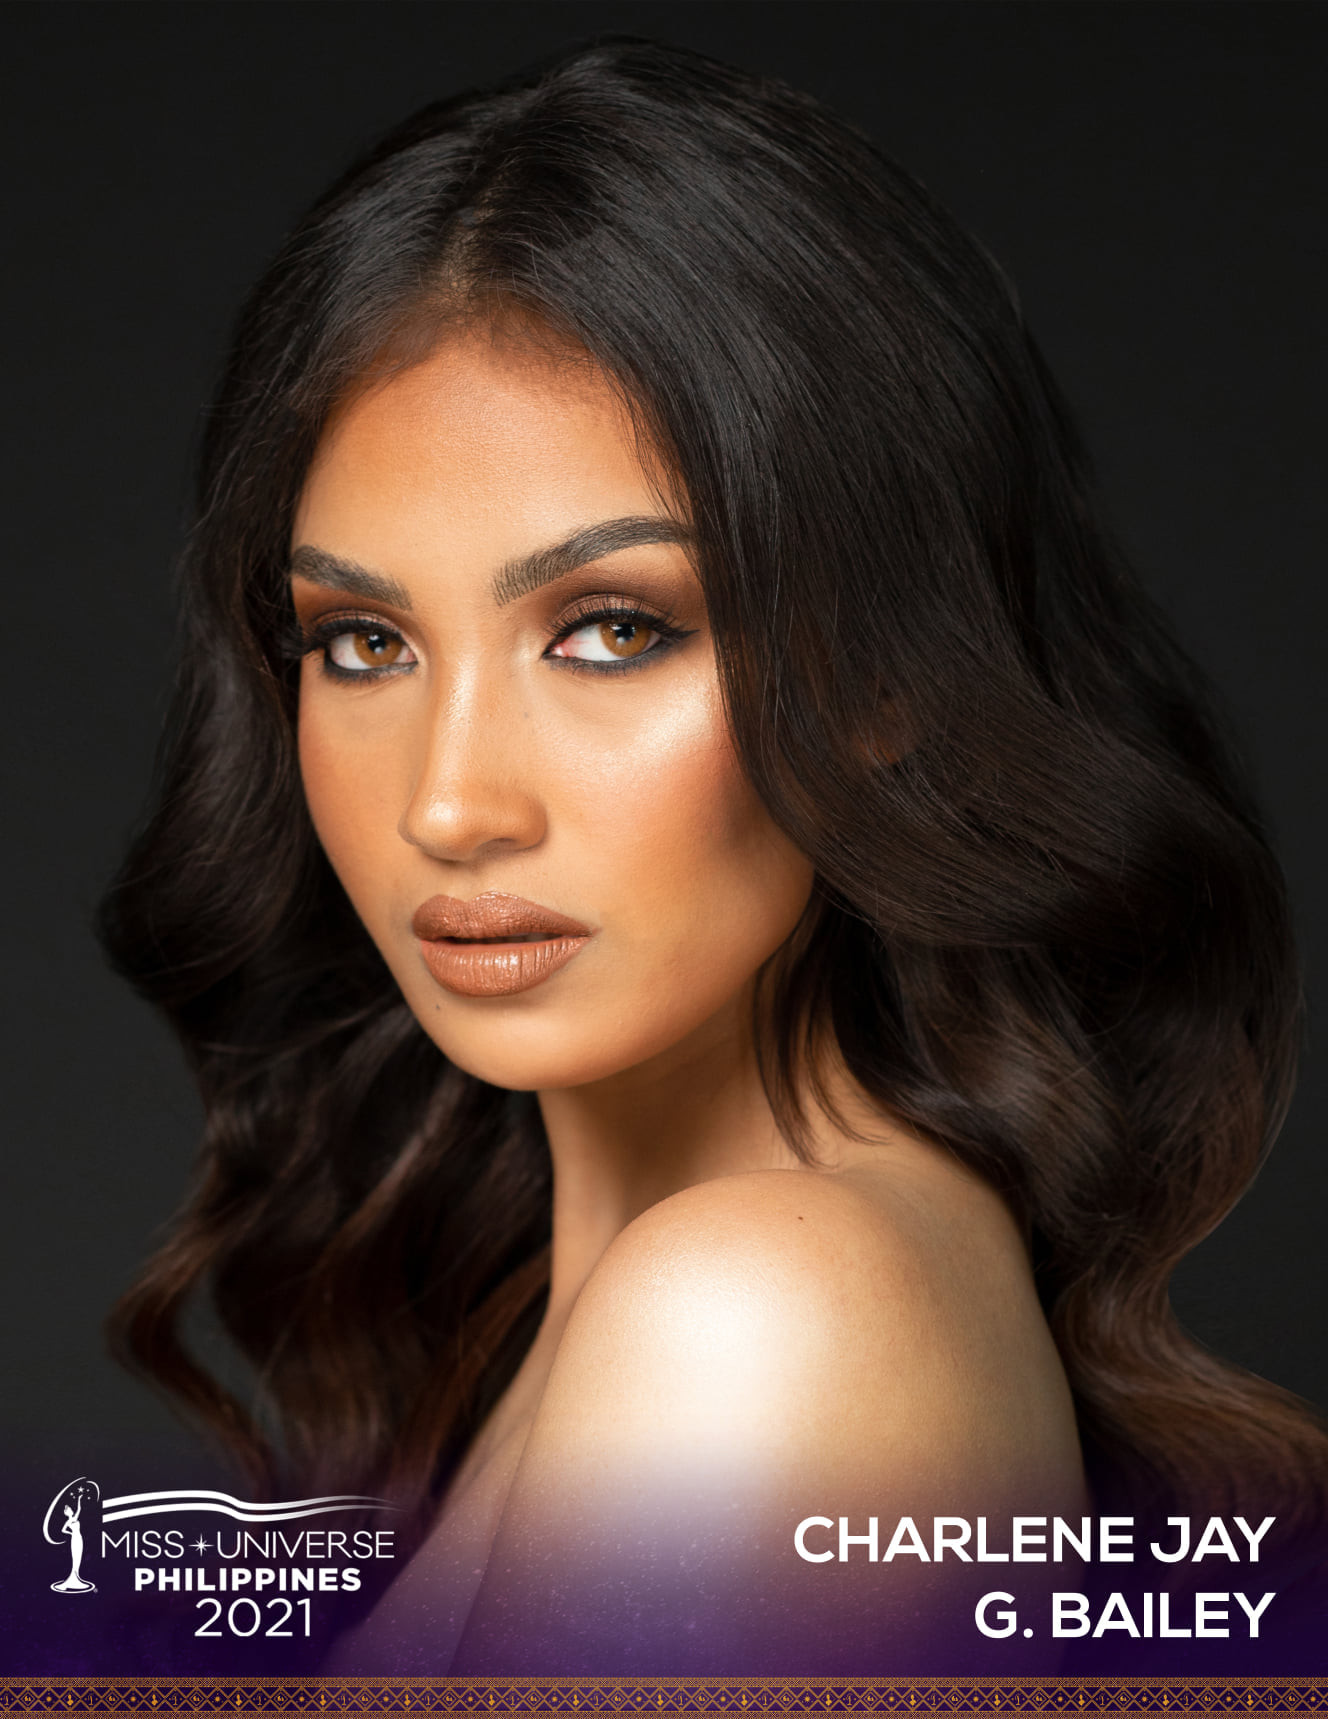 pre-candidatas a miss universe philippines 2021. - Página 5 Ala5oQ